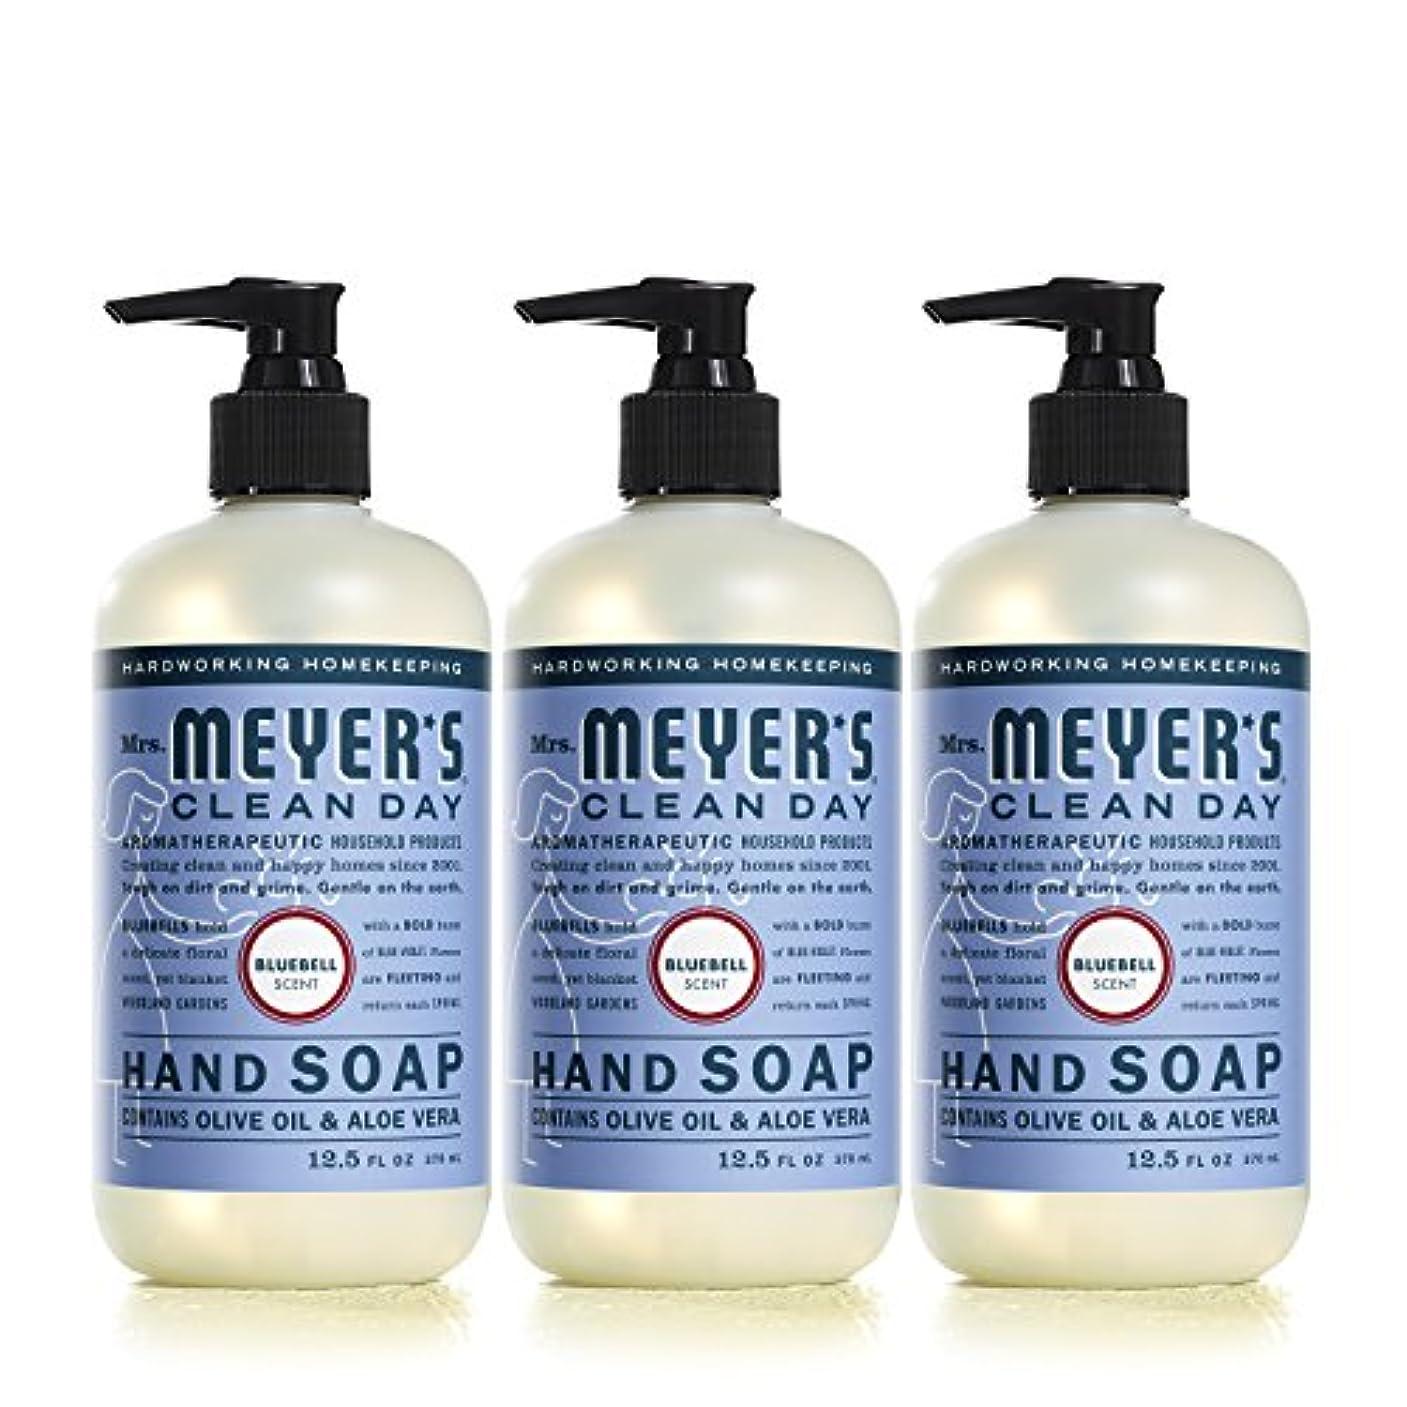 Mrs。Meyer 's Clean Day Hand Soap、?ブルーベル、12.5 FL OZ